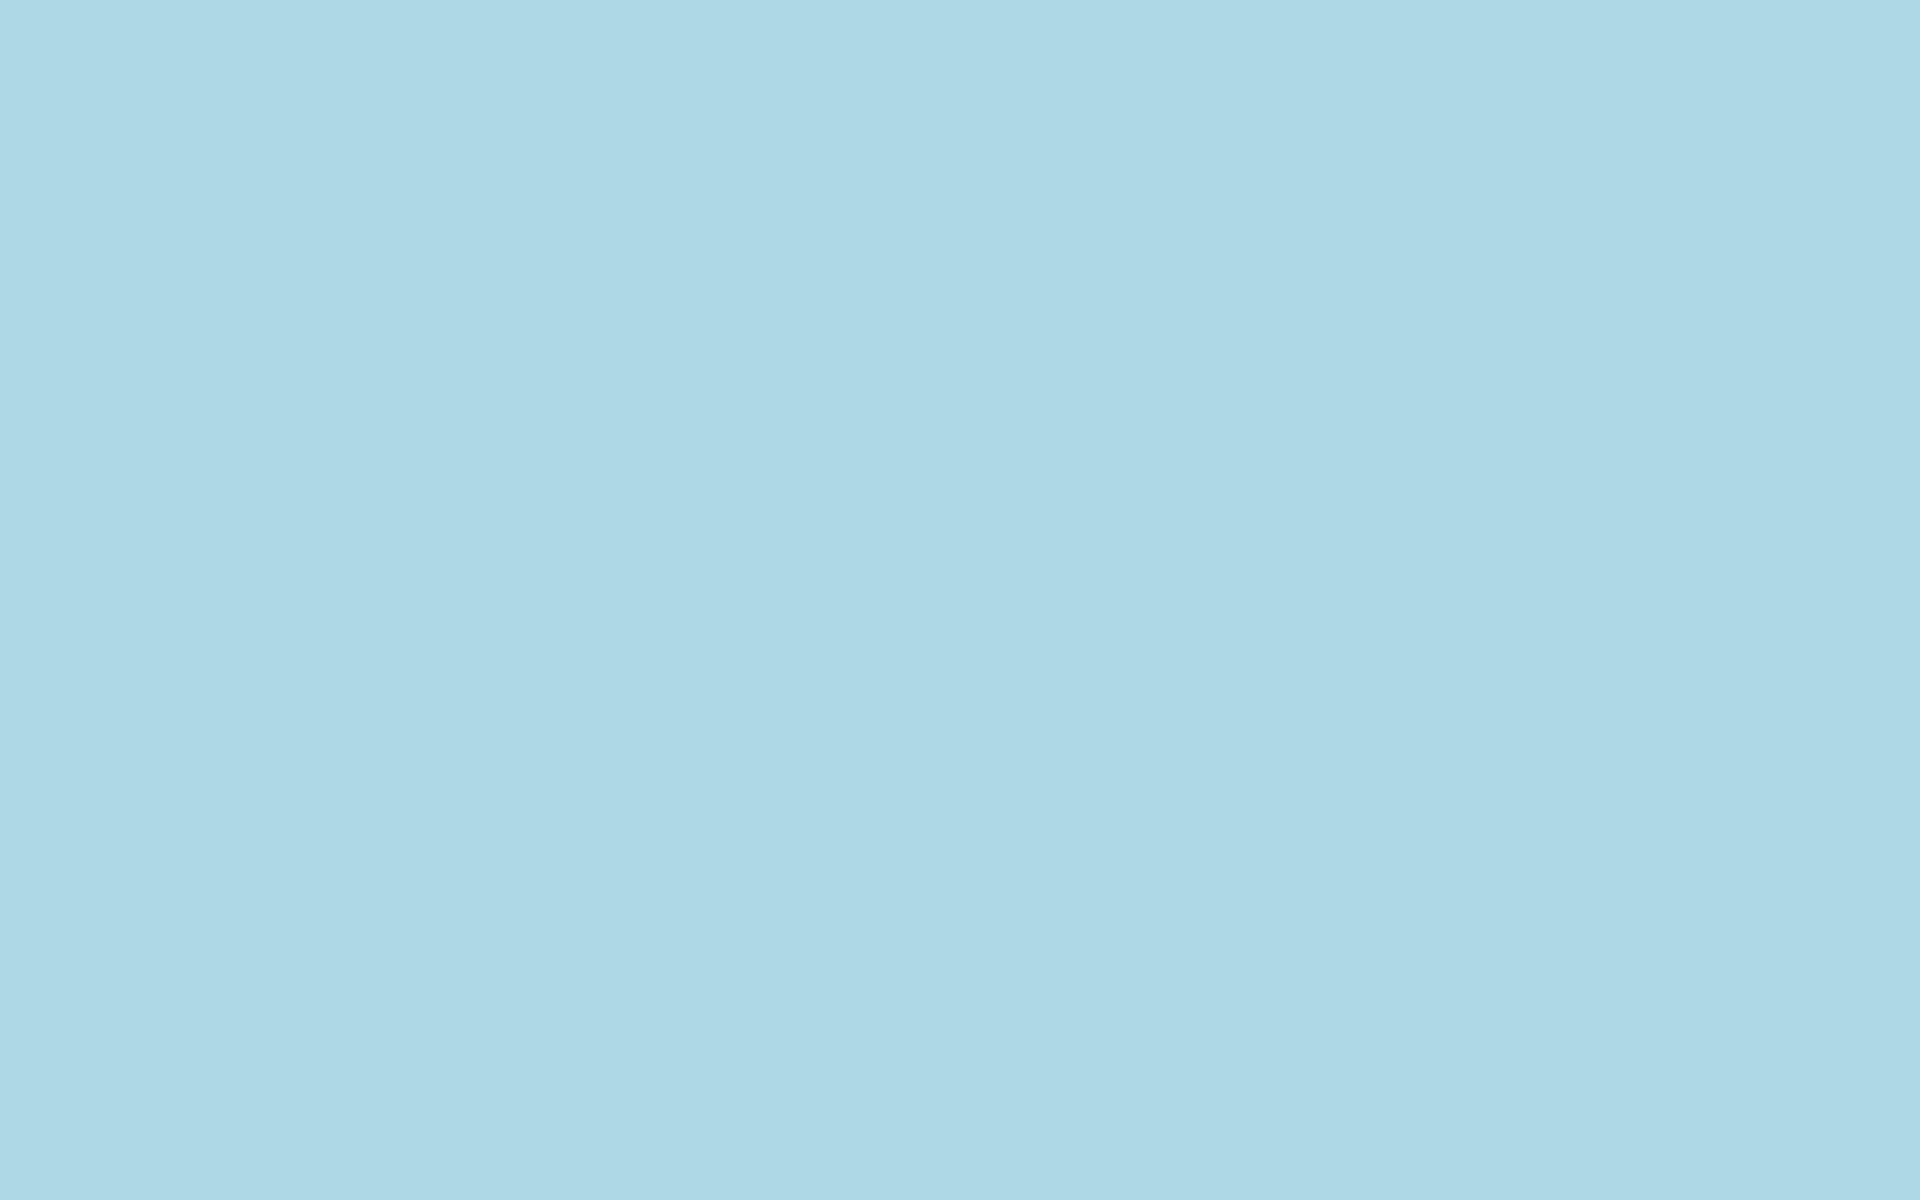 1920x1200 Light Blue Solid Color Background